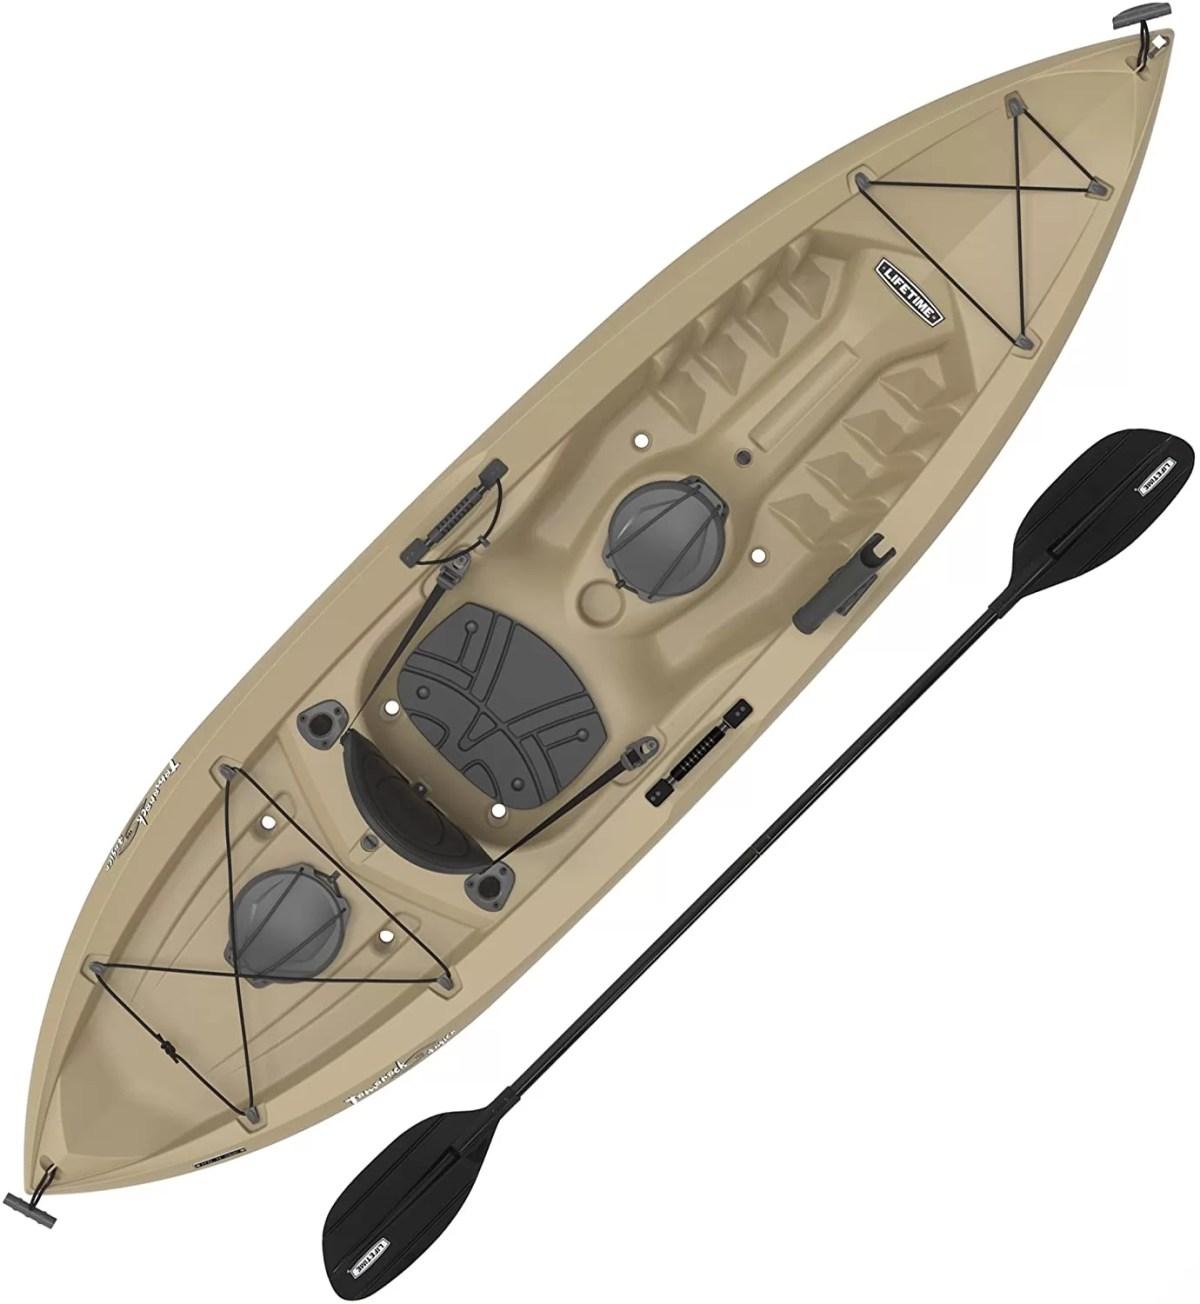 Lifetime Tamarack Fishing Kayak